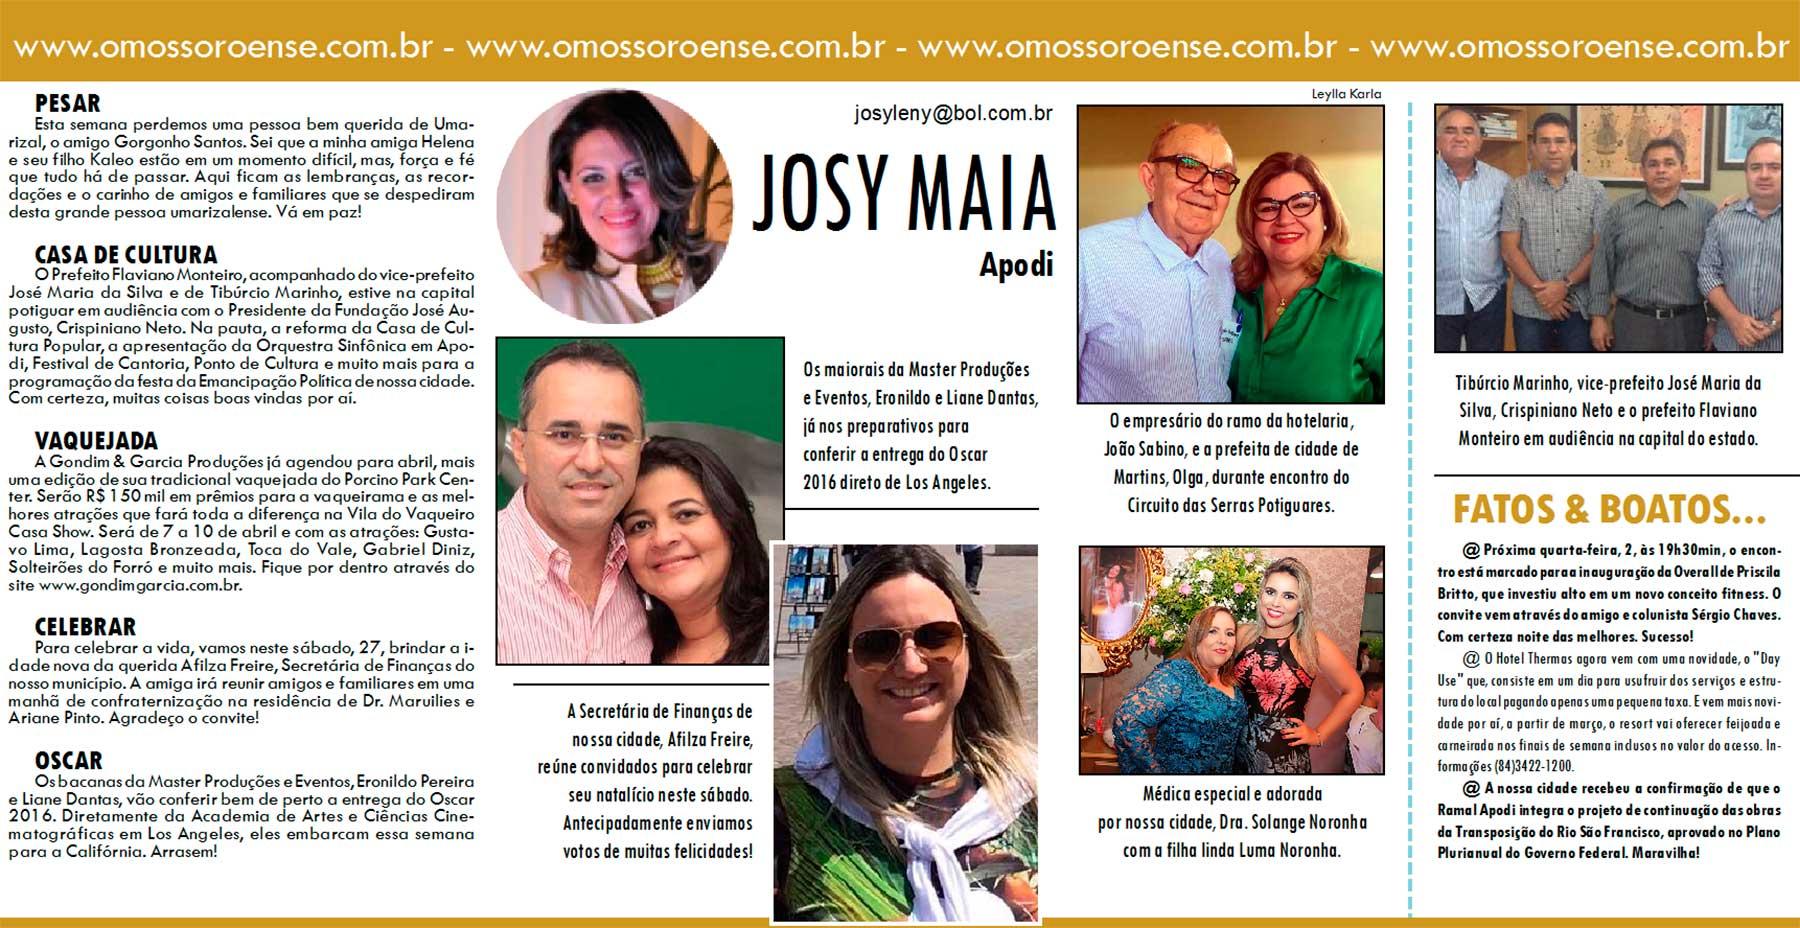 JOSY-MAIA---APODI---24-02-16